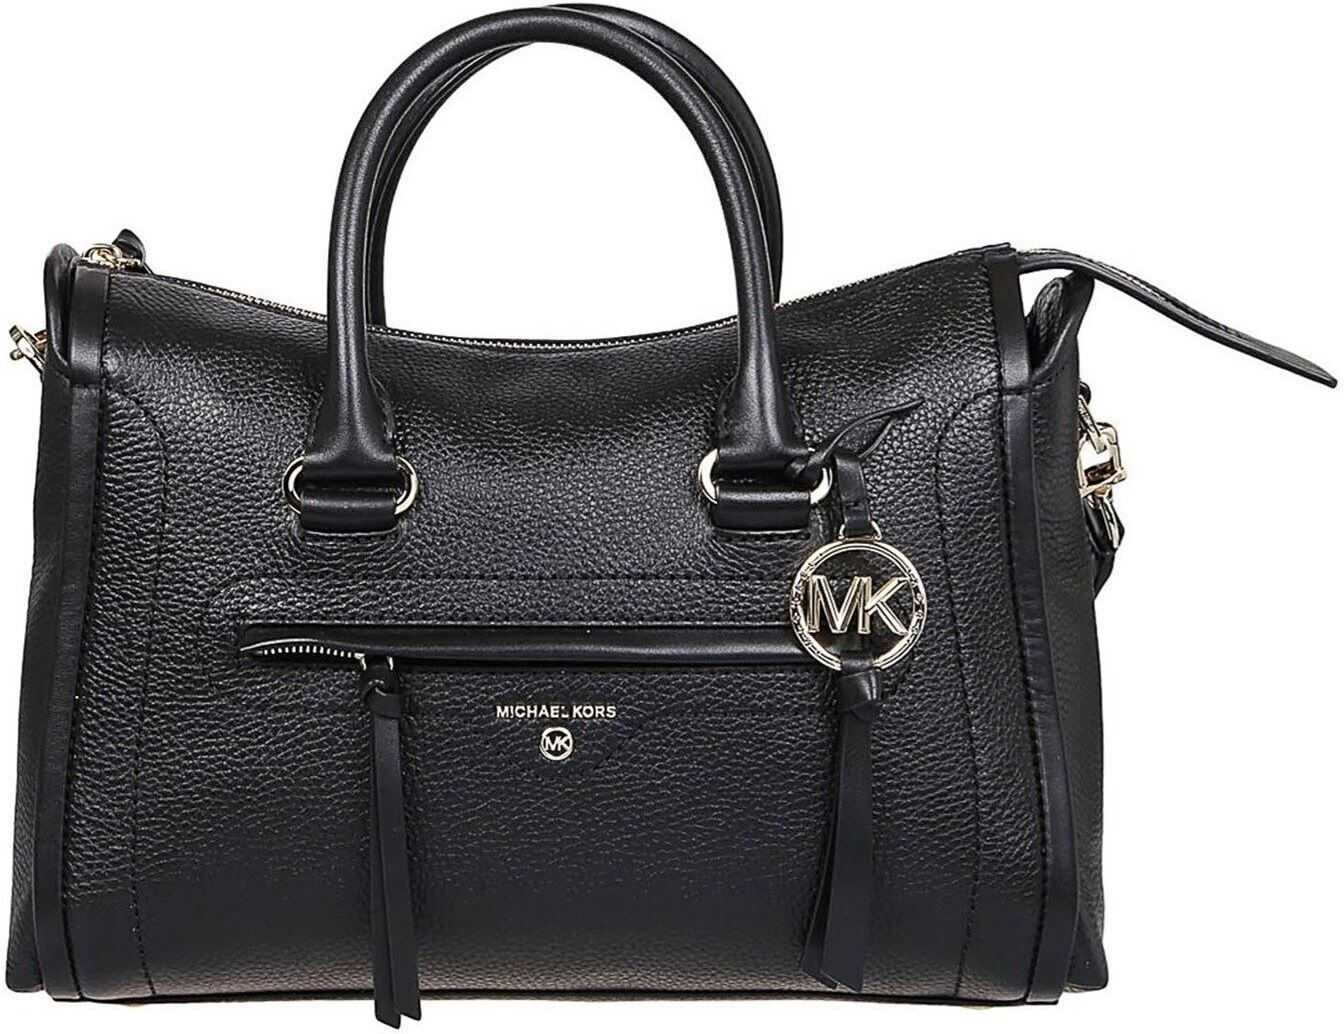 Michael Kors Carine Medium Bag In Black 30S0GCCS2L BLACK Black imagine b-mall.ro